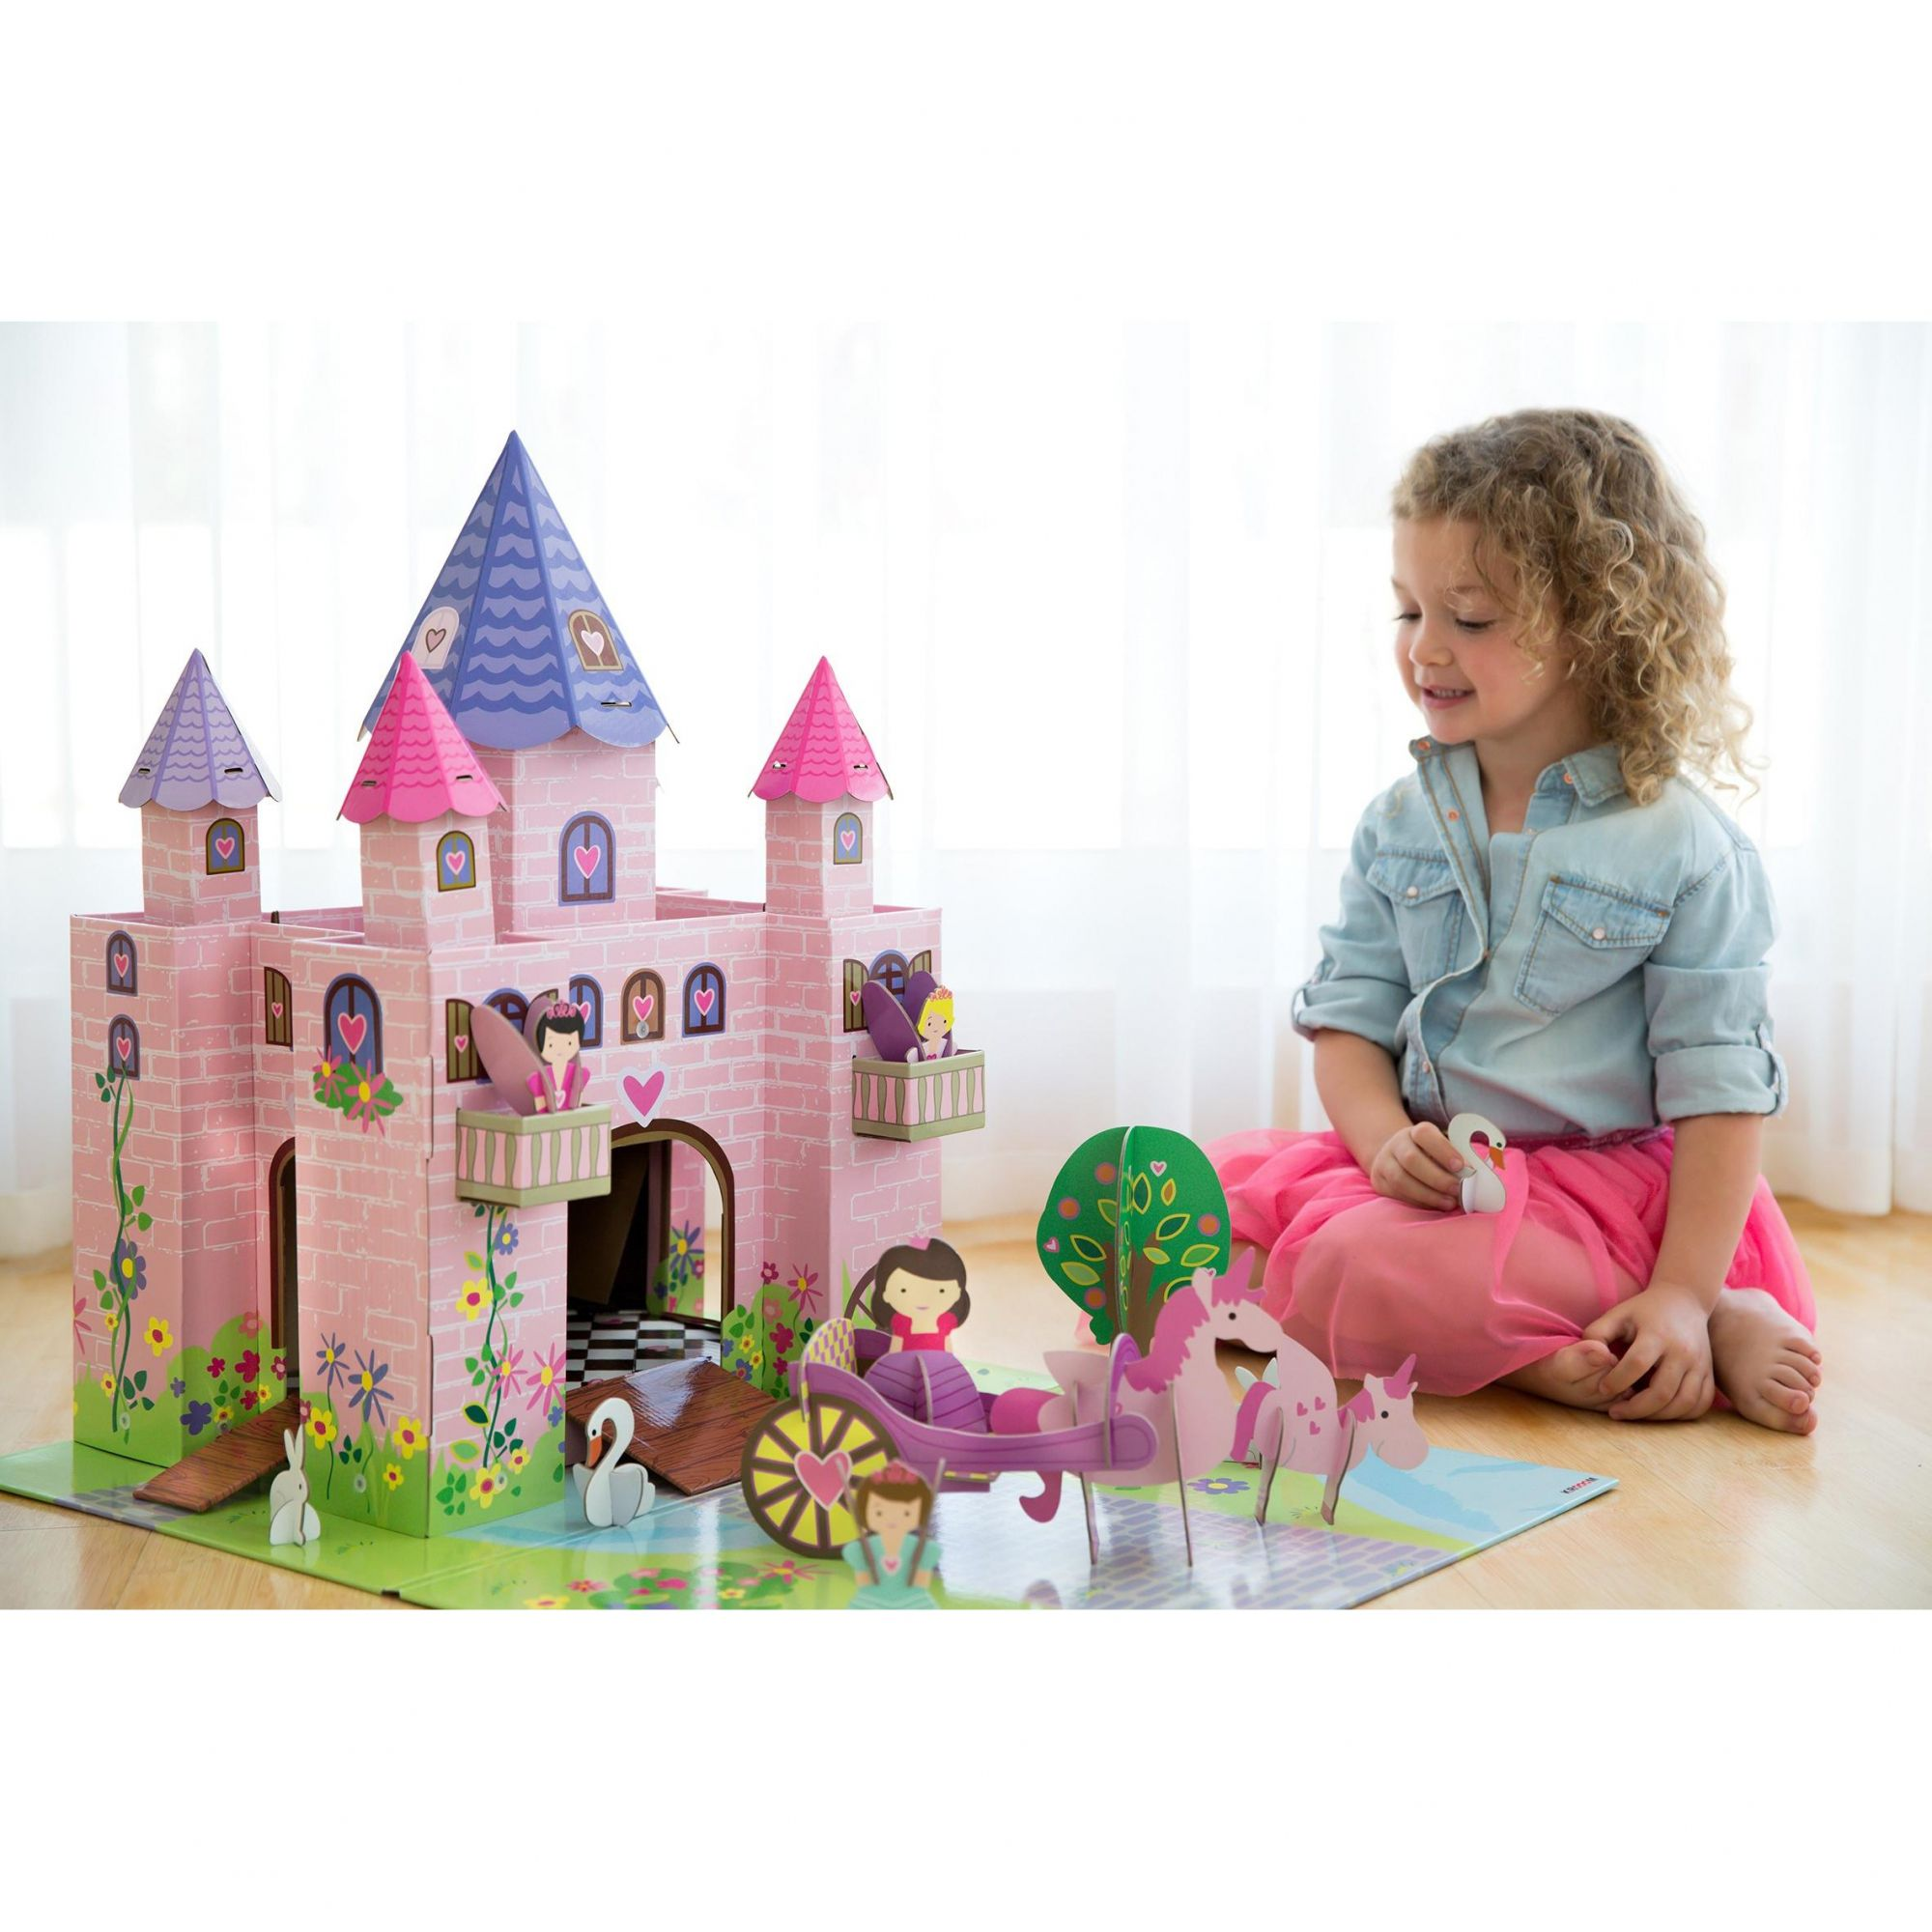 Cenário para Montar Castelo Princesas Krooom